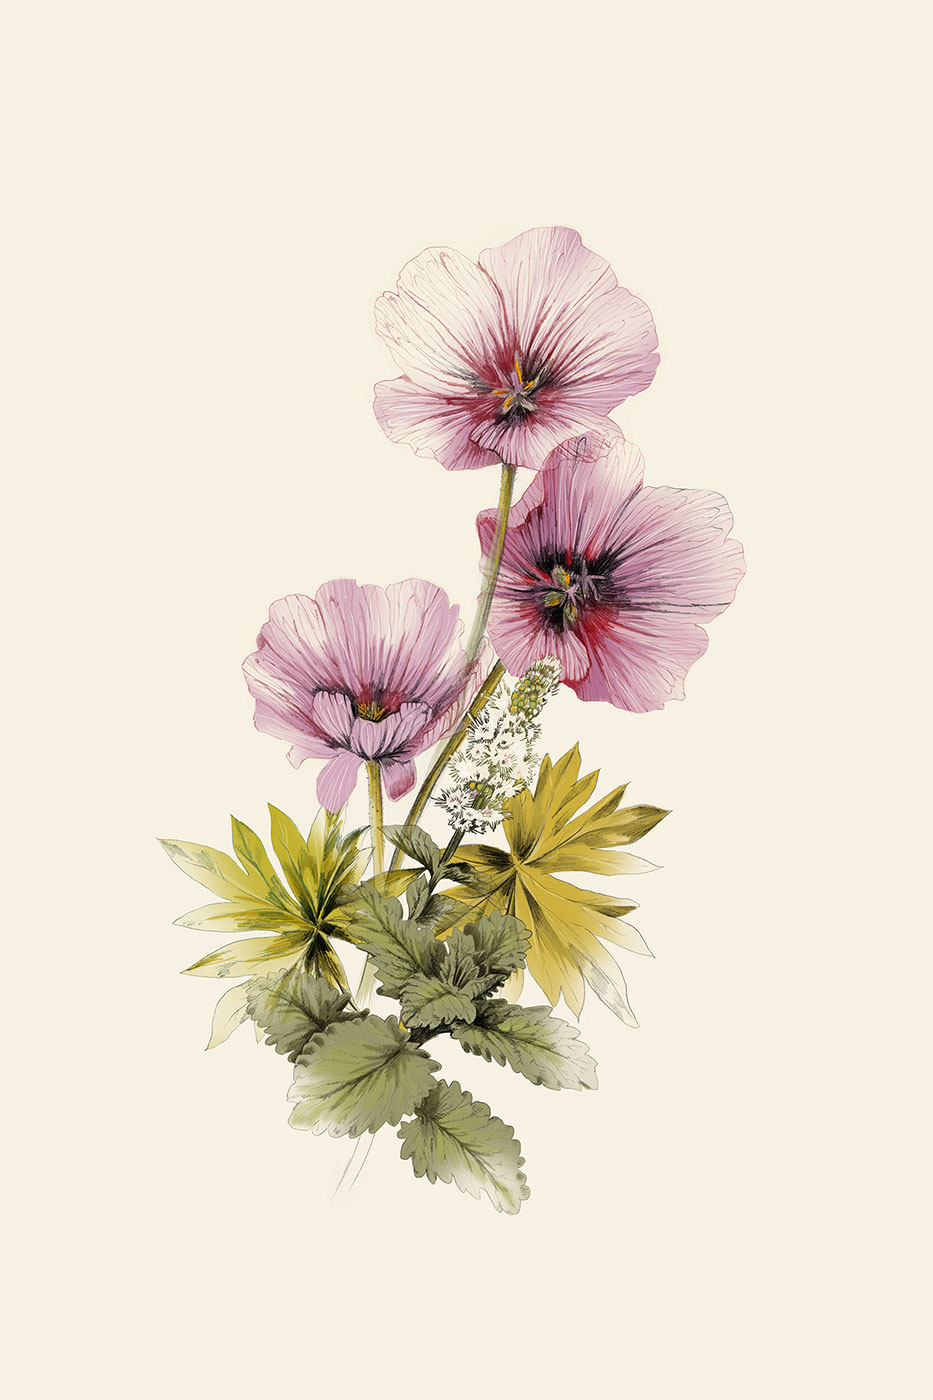 LASC_Personal_BotanicalHandcream_GeraniumGardenmint.jpg